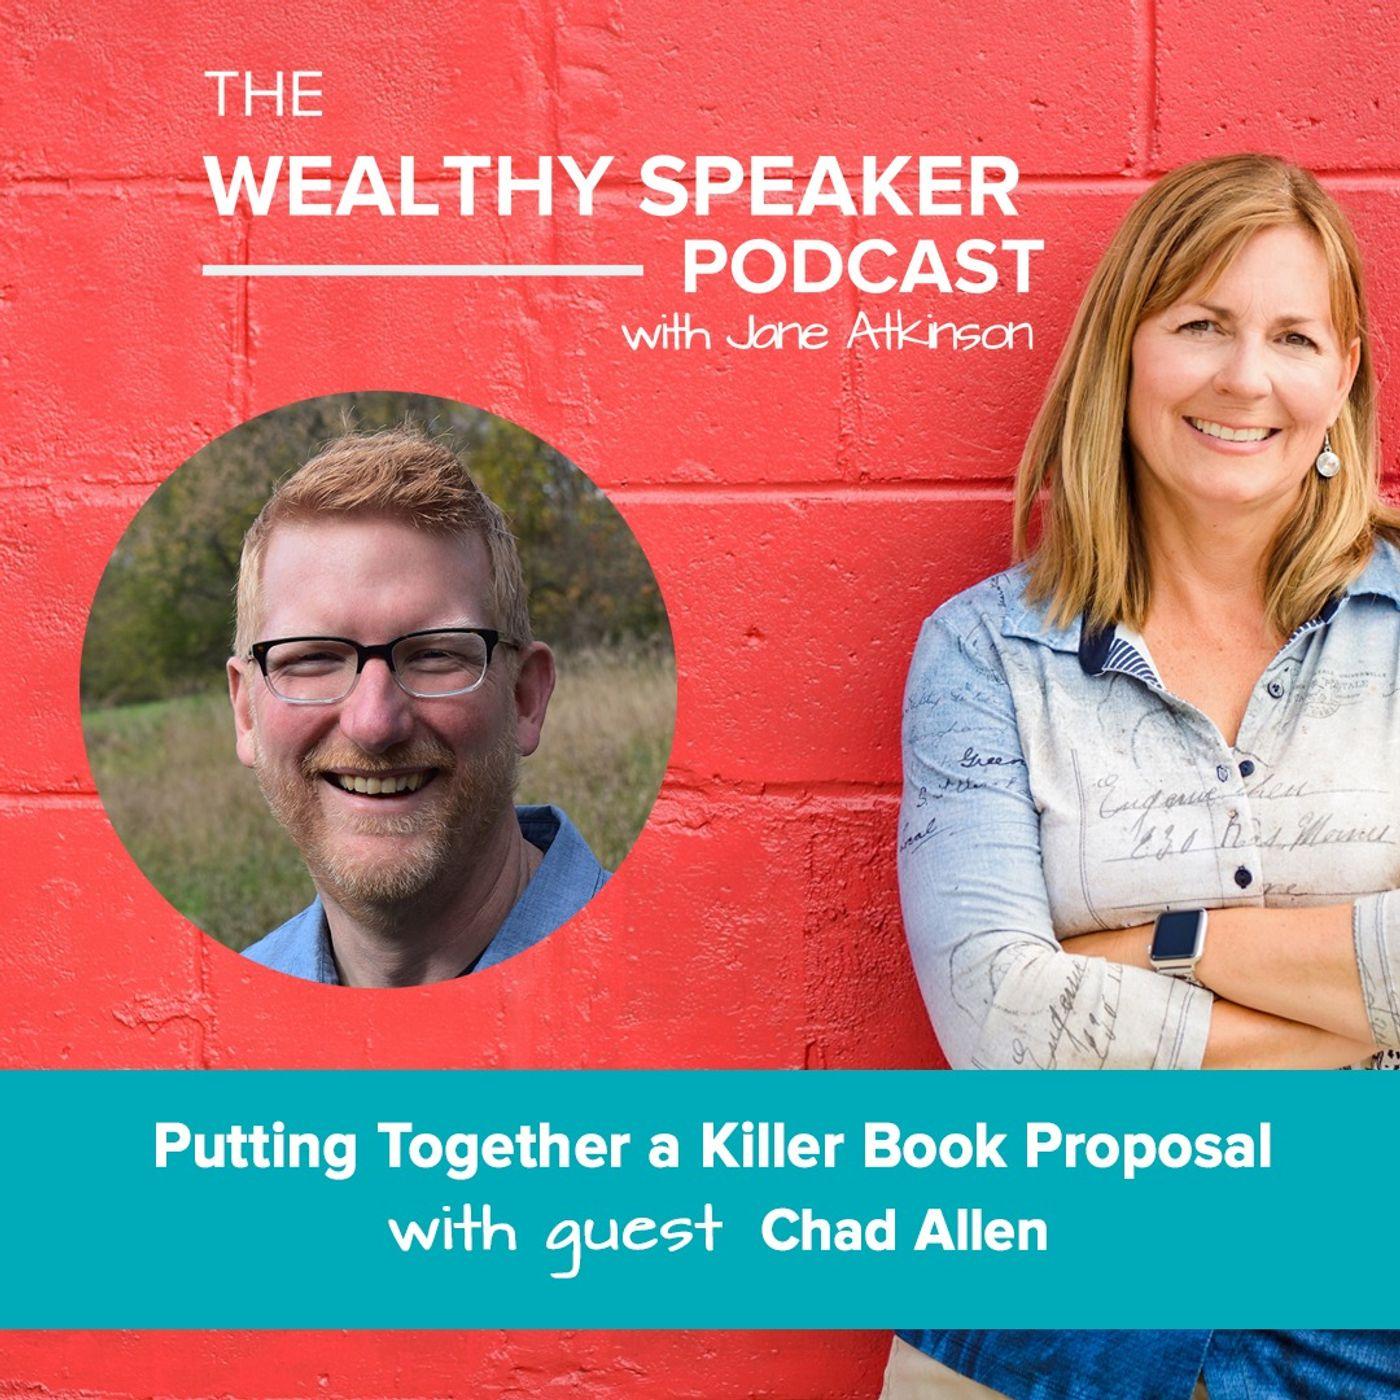 The Wealthy Speaker Podcast Jane Atkinson Chad Allen book proposal